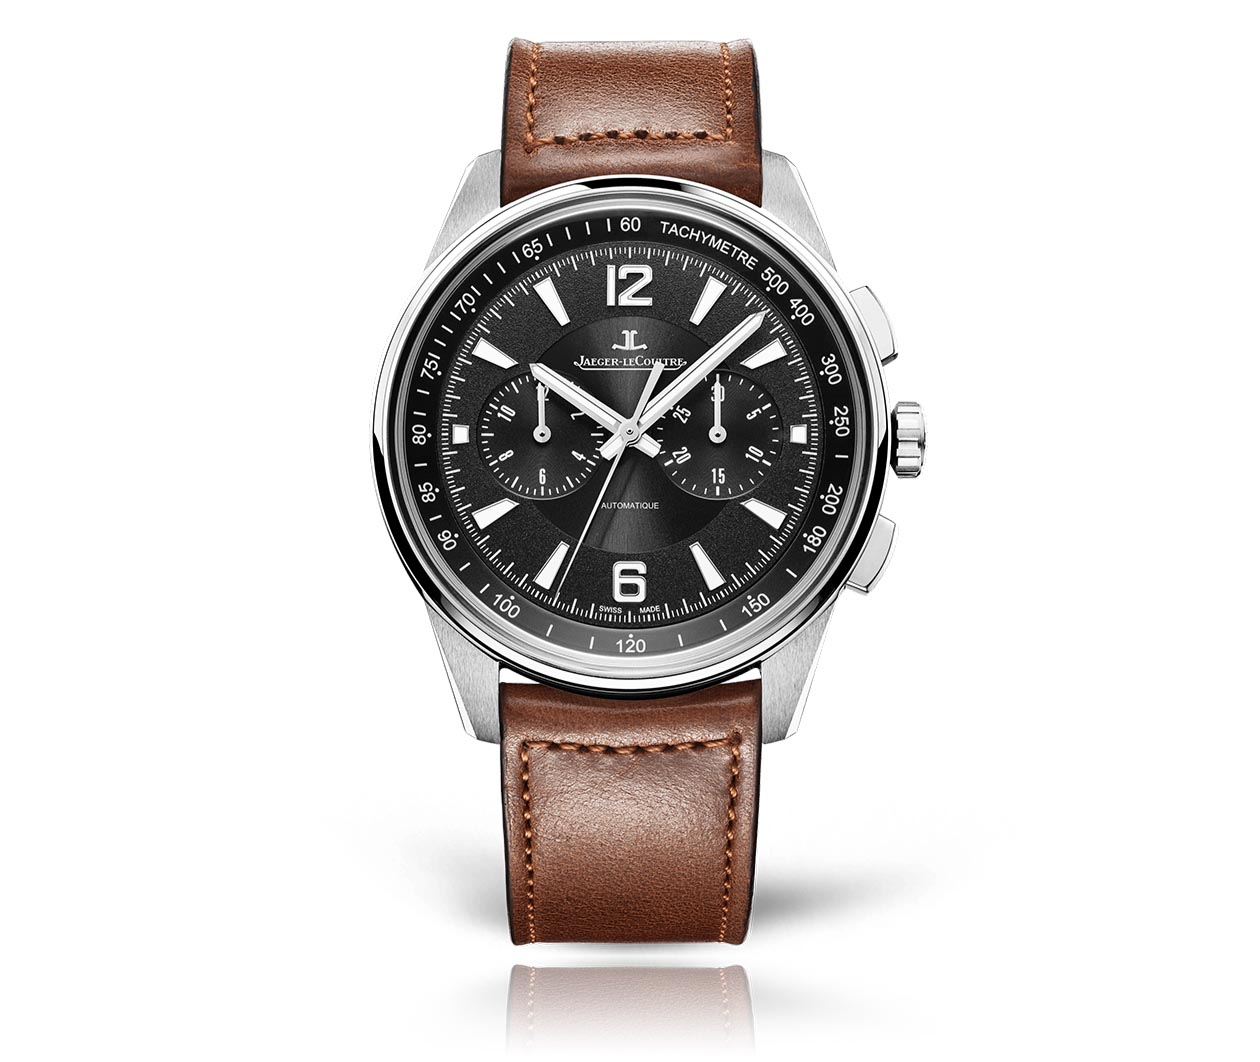 JaegerLeCoultre Polaris Chronograph 9028471 Flatlay FINAL